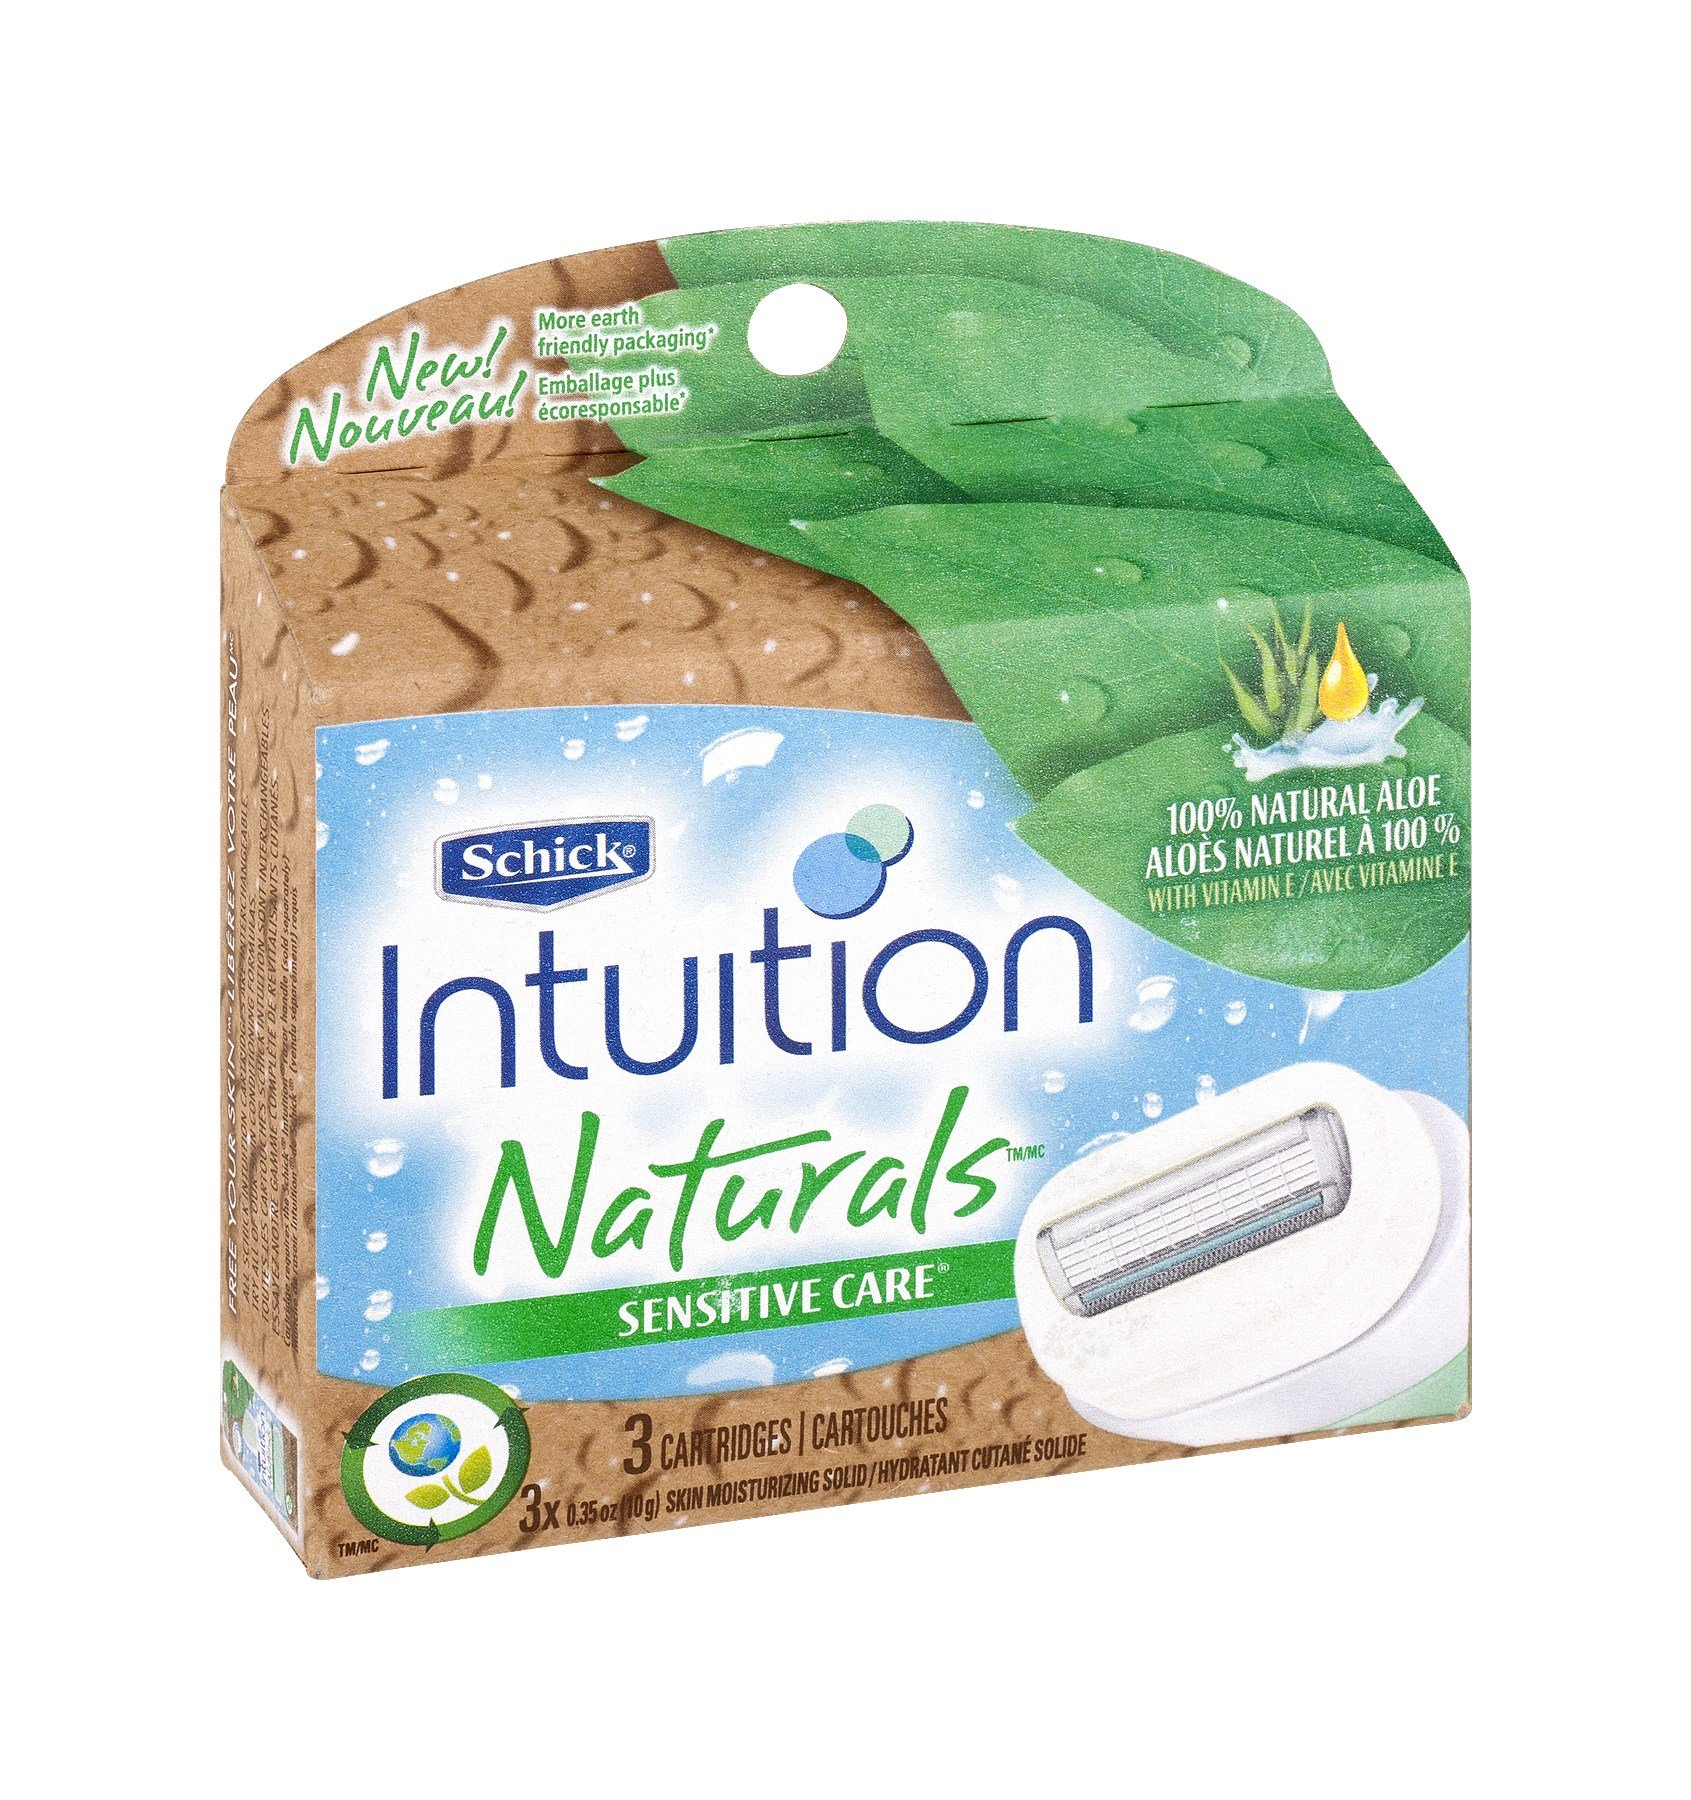 Schick Intuition Naturals Sensitive Care 100% Aloe w/ Vitamin E Cartridges